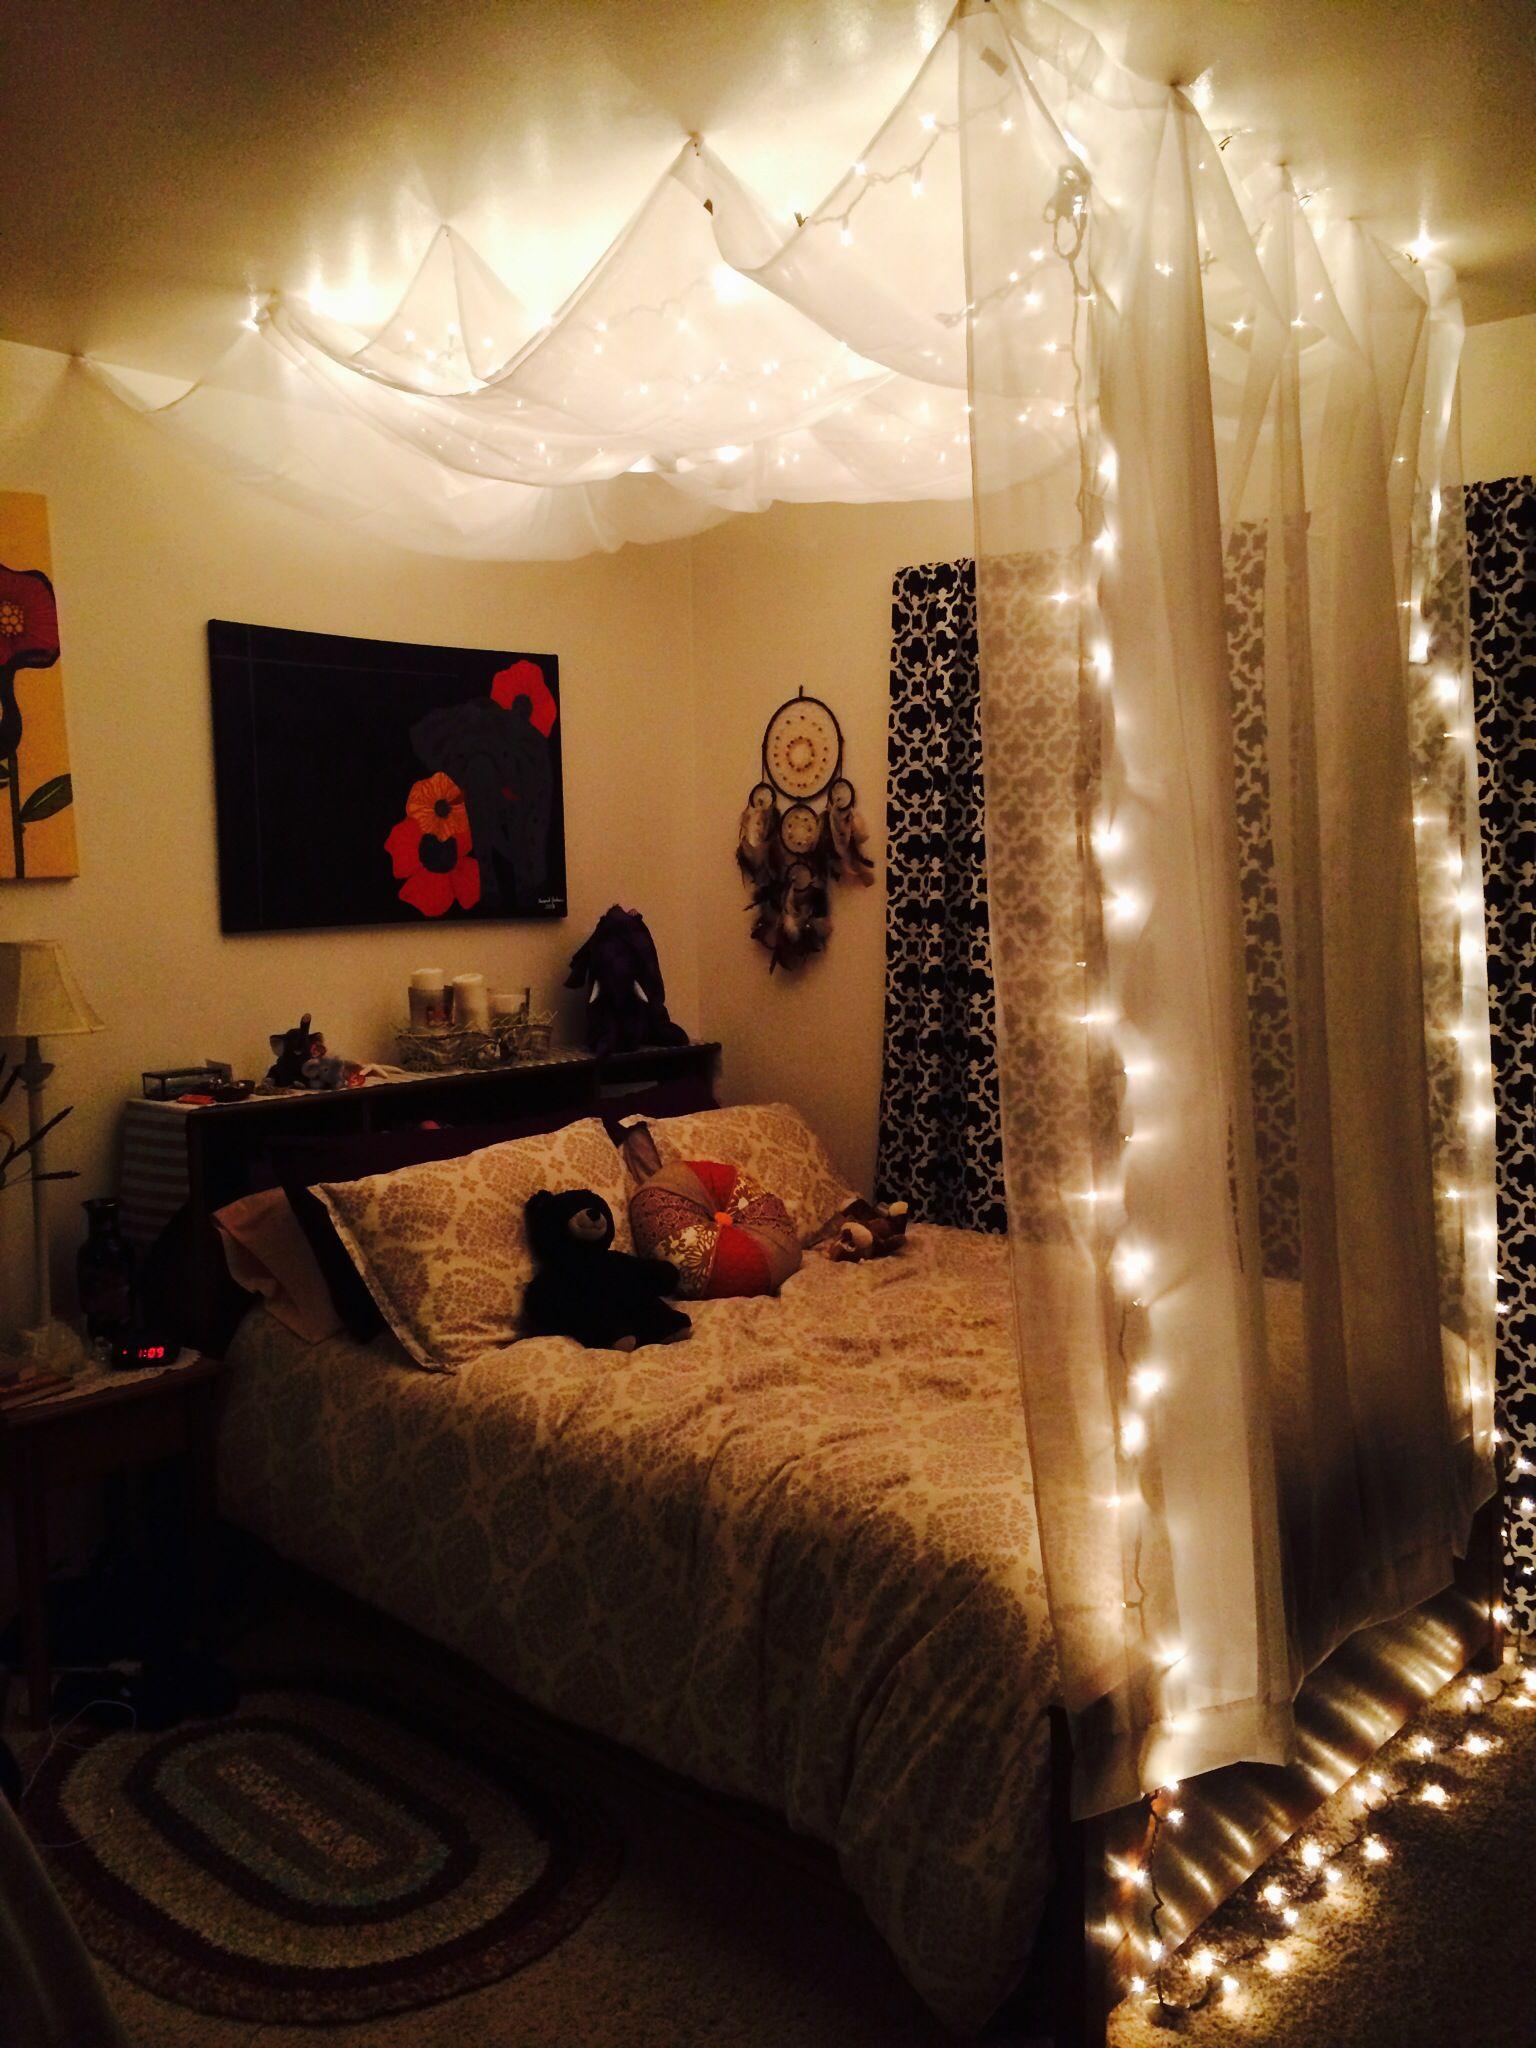 Quarto luzes  DIY Hanging Bed Canopy  Using 5 sheer